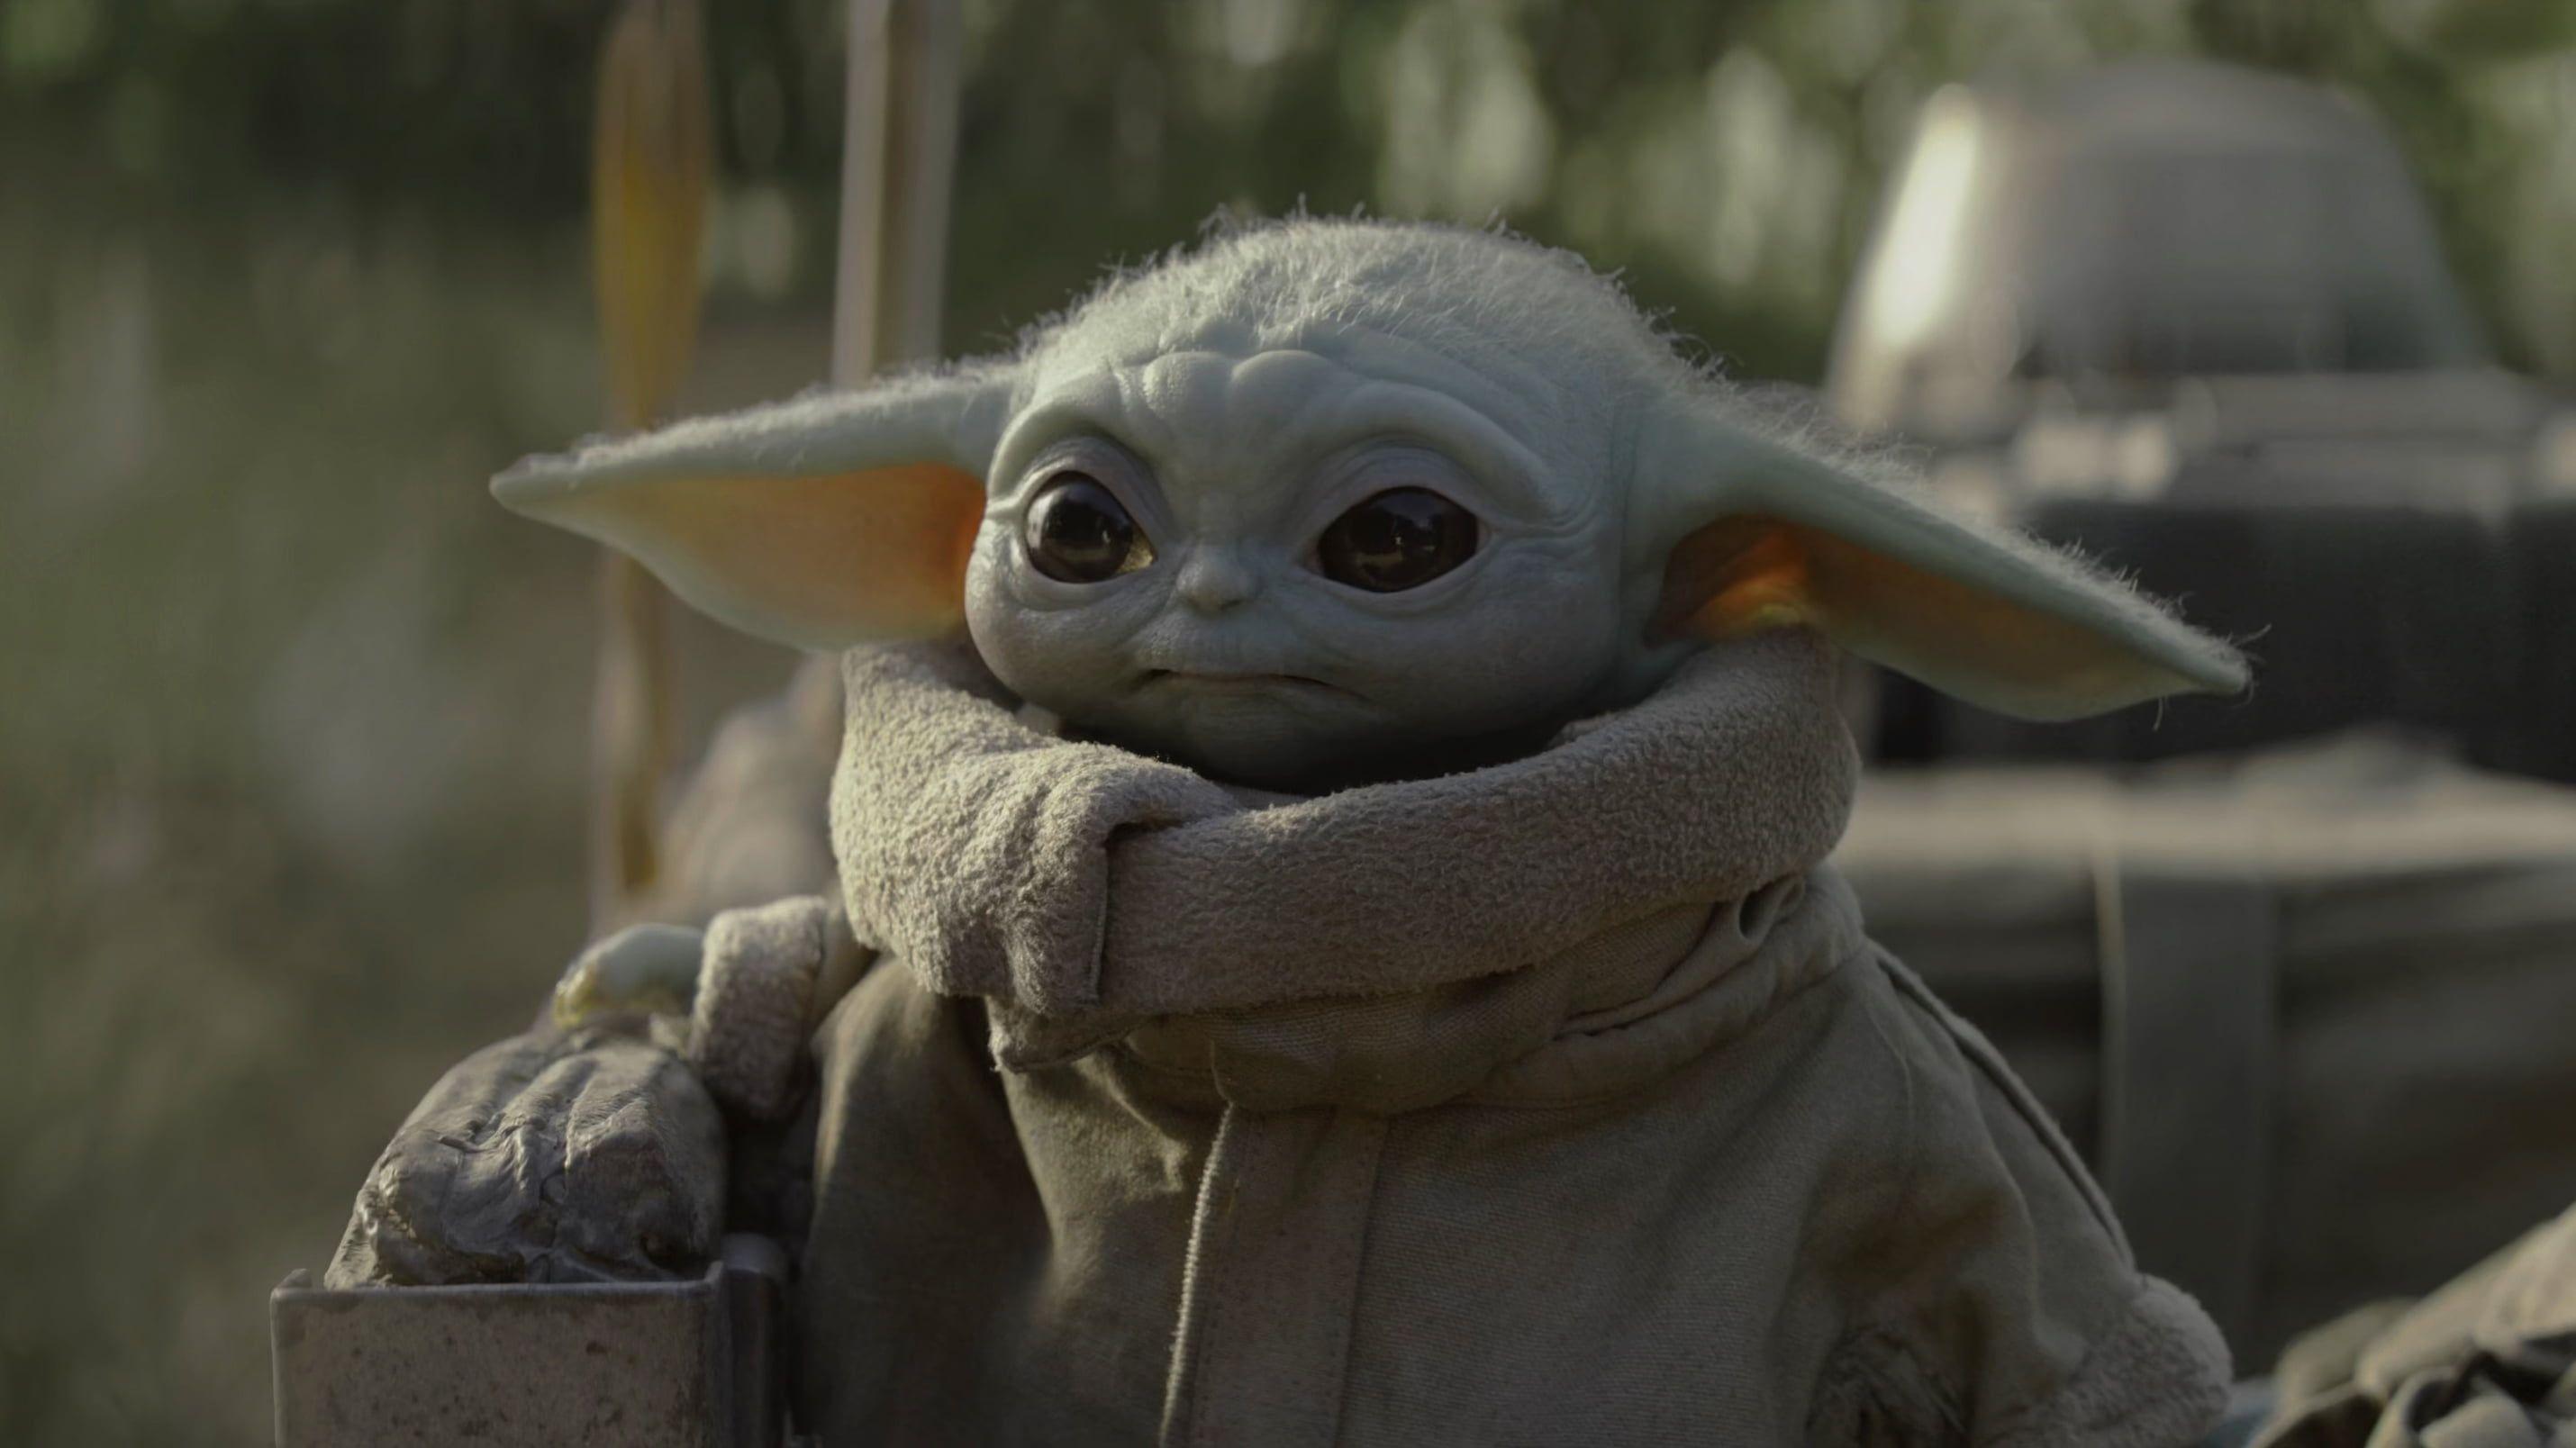 The Mandalorian Baby Yoda 2k Wallpaper Hdwallpaper Desktop In 2021 Yoda Wallpaper Wallpaper Yoda